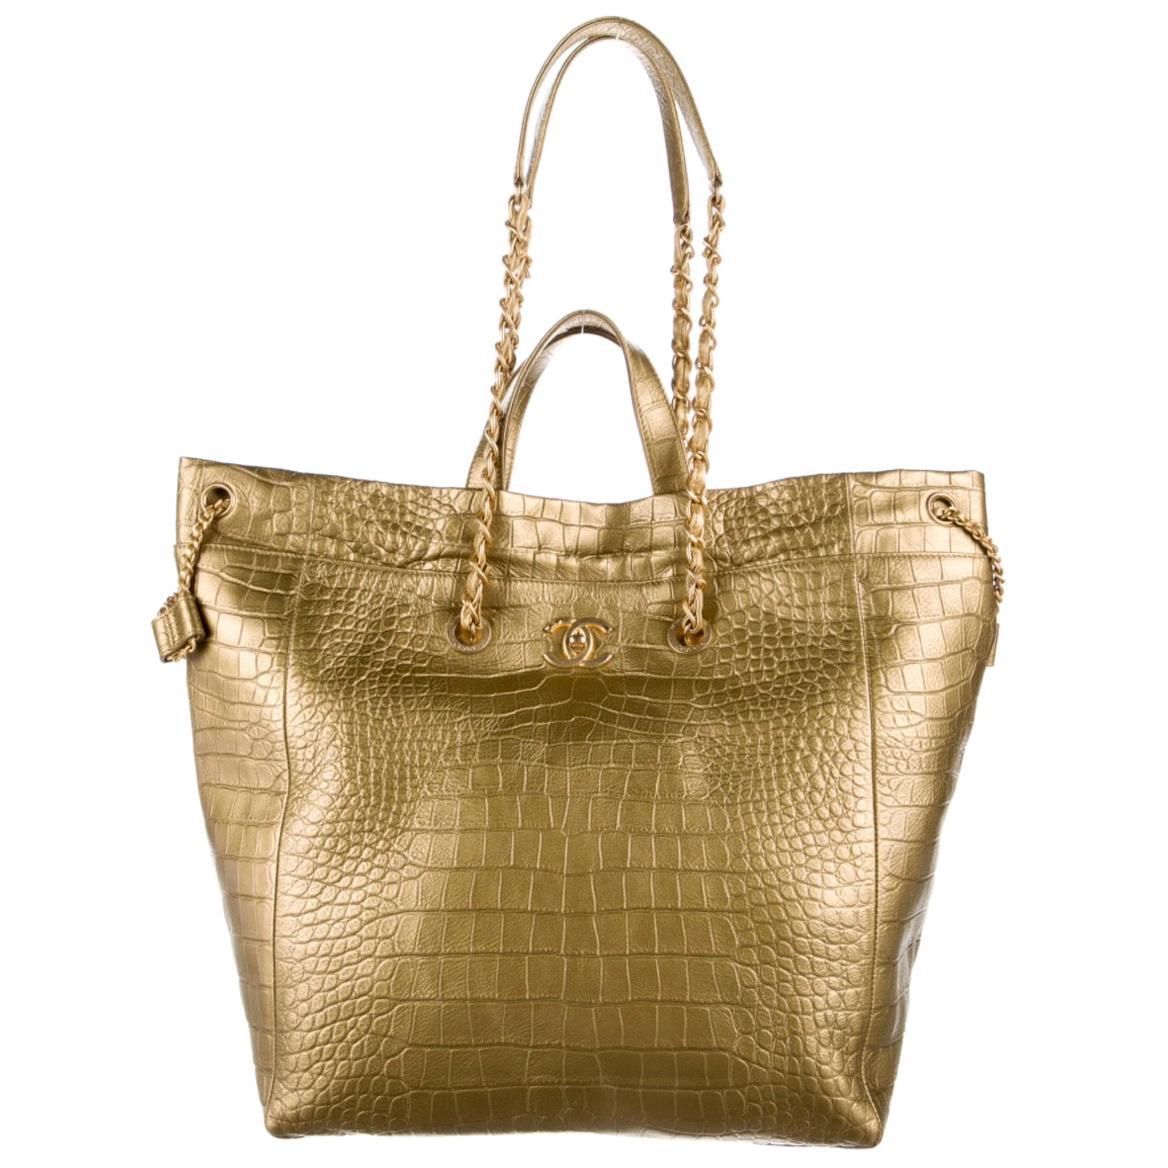 Chanel Leather Snake Exotic Print Gold Carryall Top Handle Shoulder Tote Bag